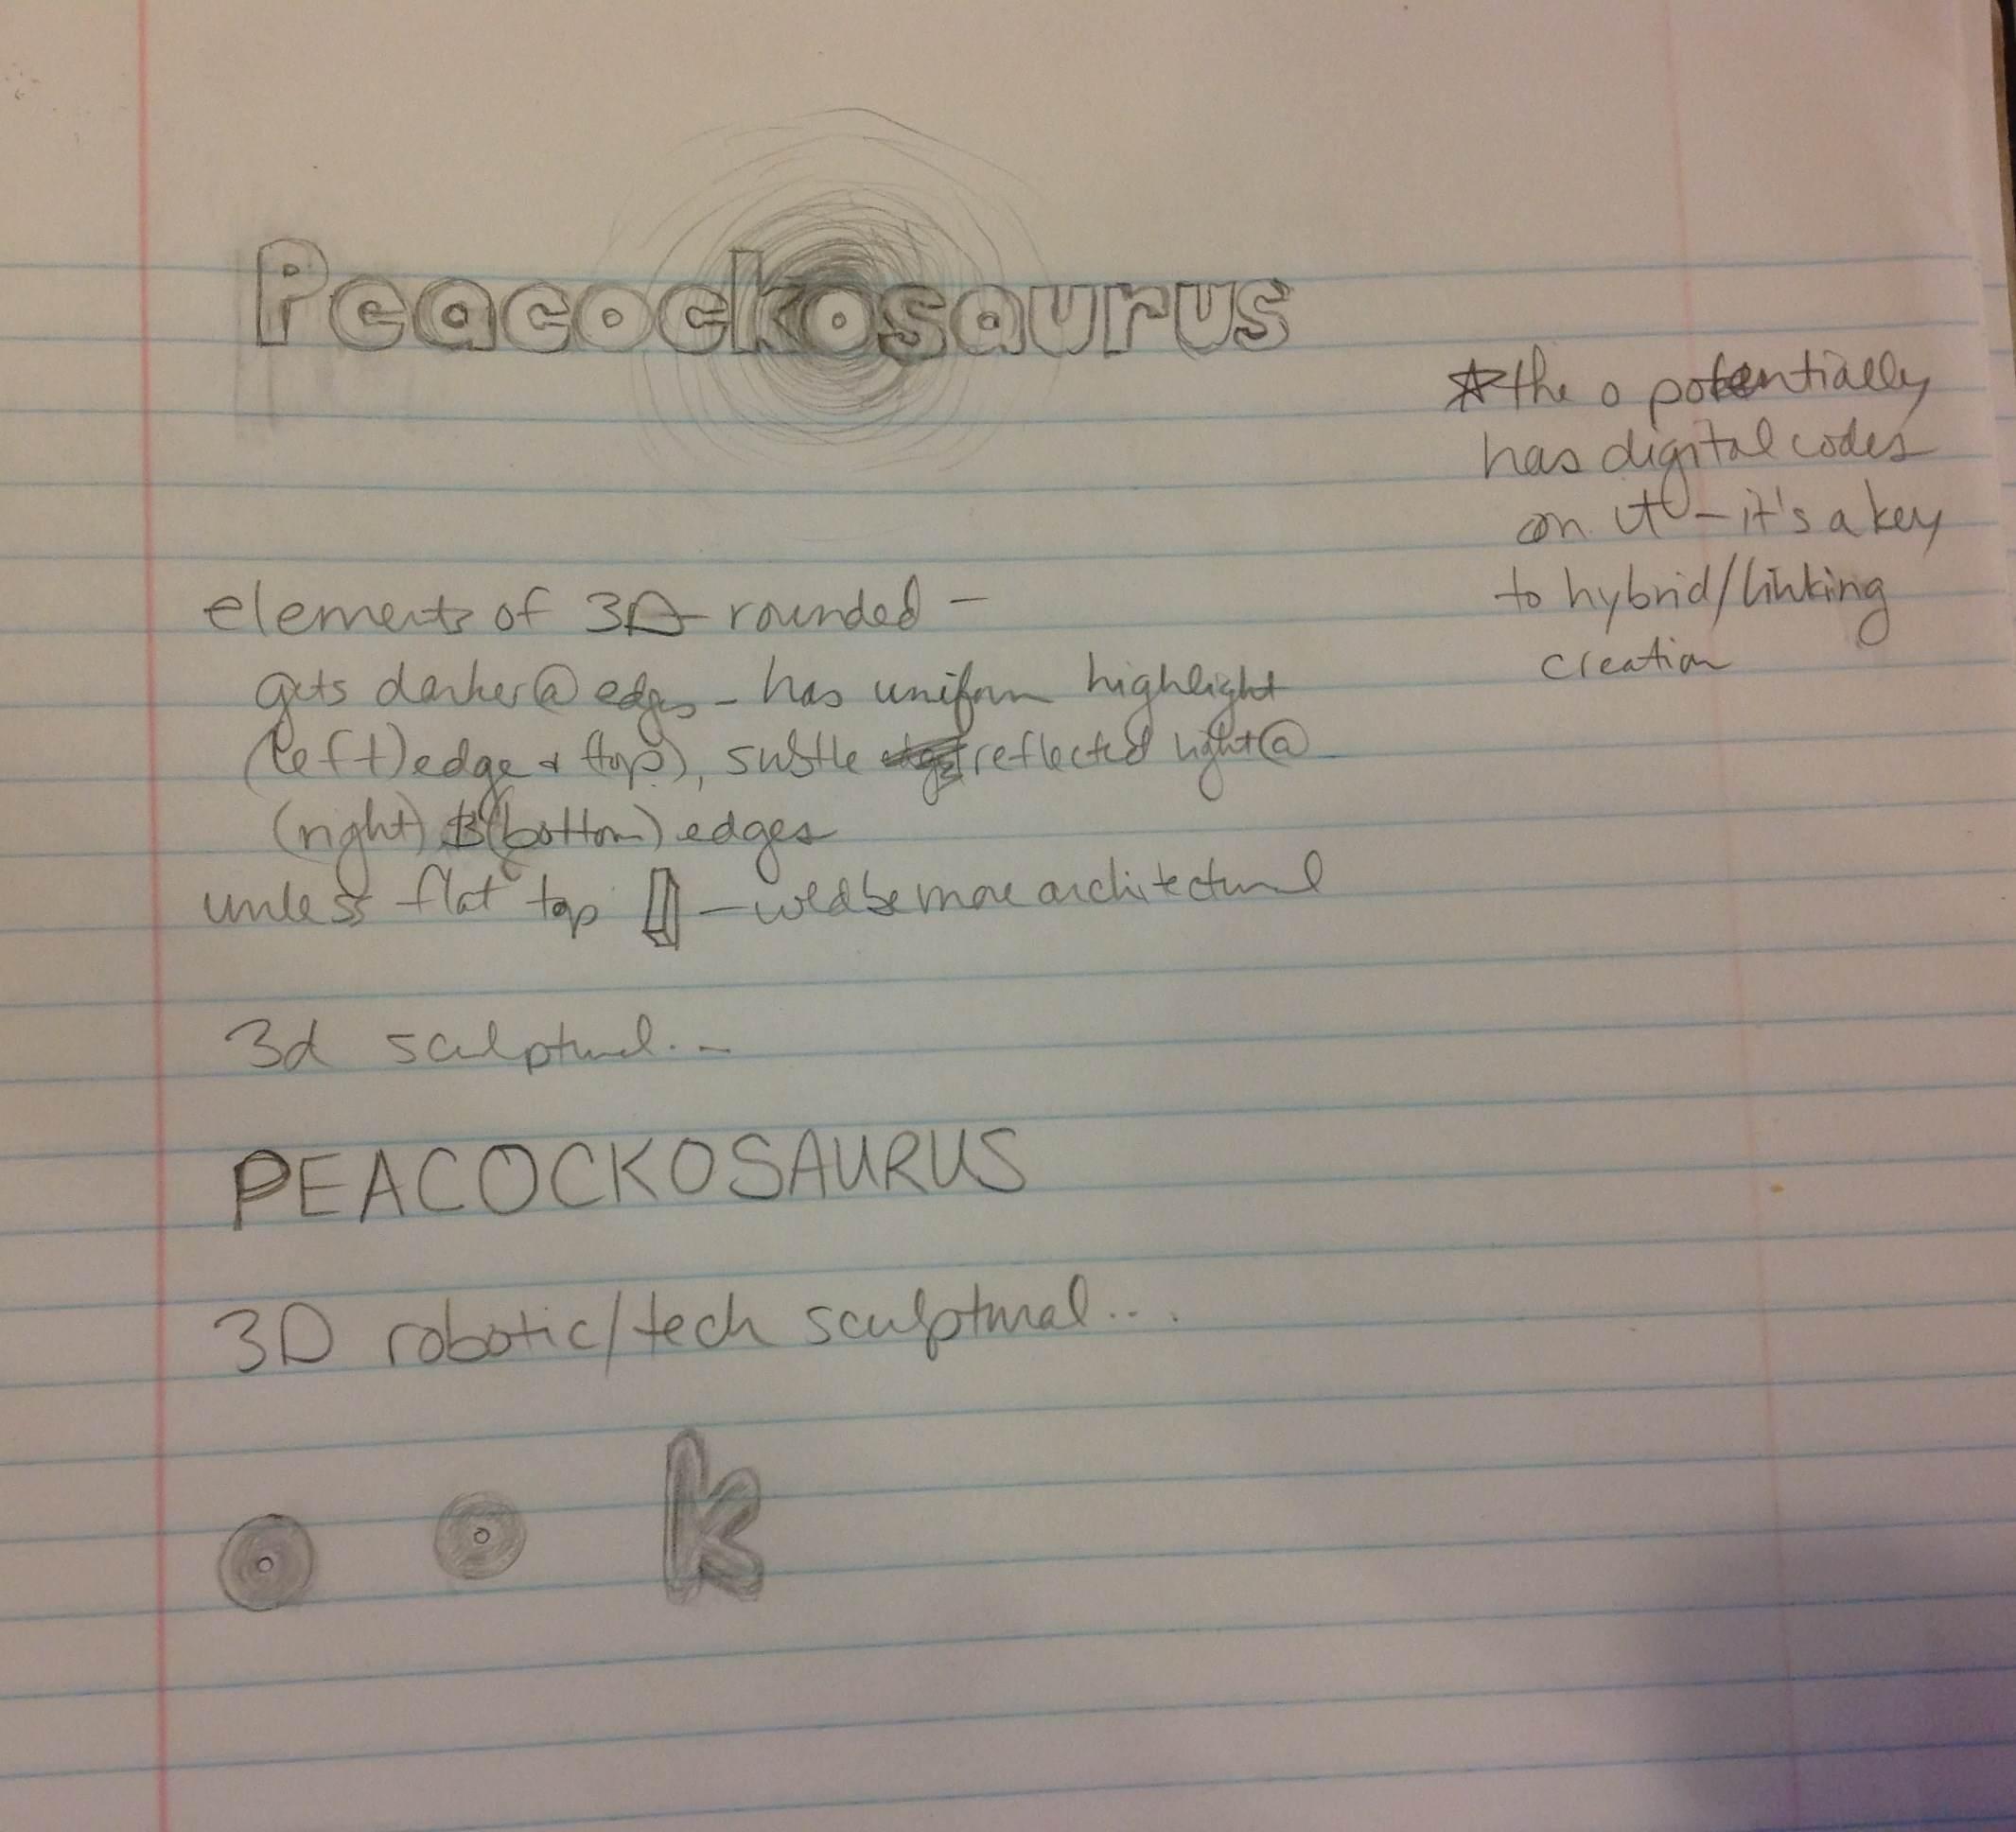 Peacockosaurus - image 5 - student project